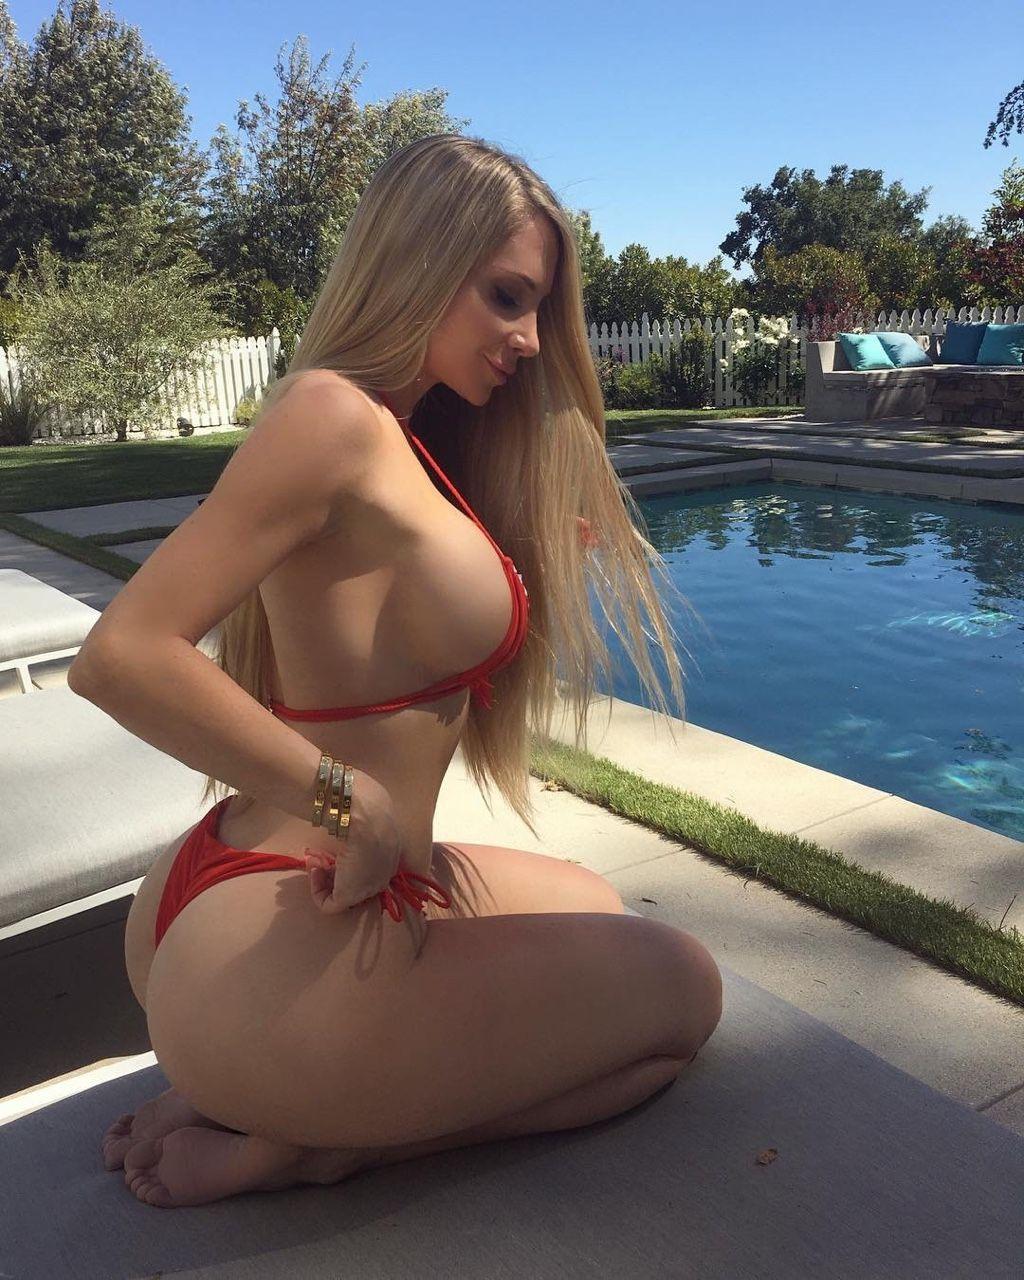 Chiara Scelsi Sexy. 2018-2019 celebrityes photos leaks! nude (39 photos)